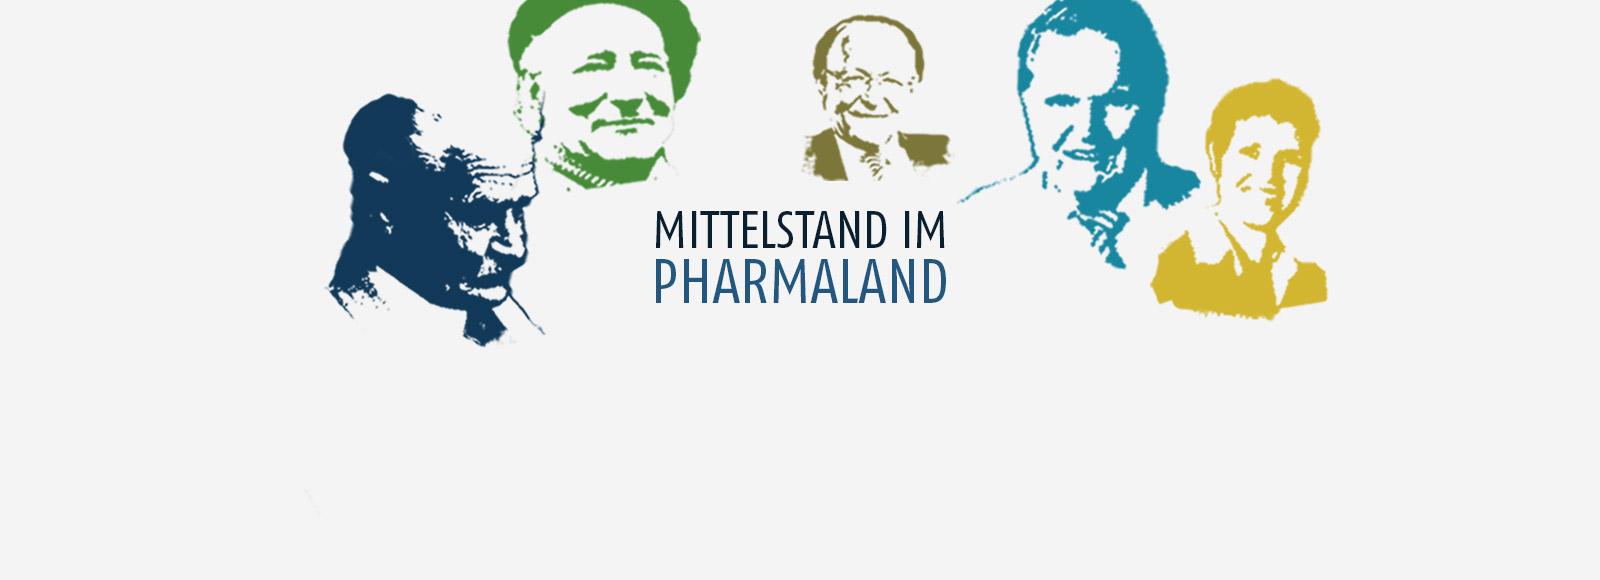 Mittelstand im Pharmaland